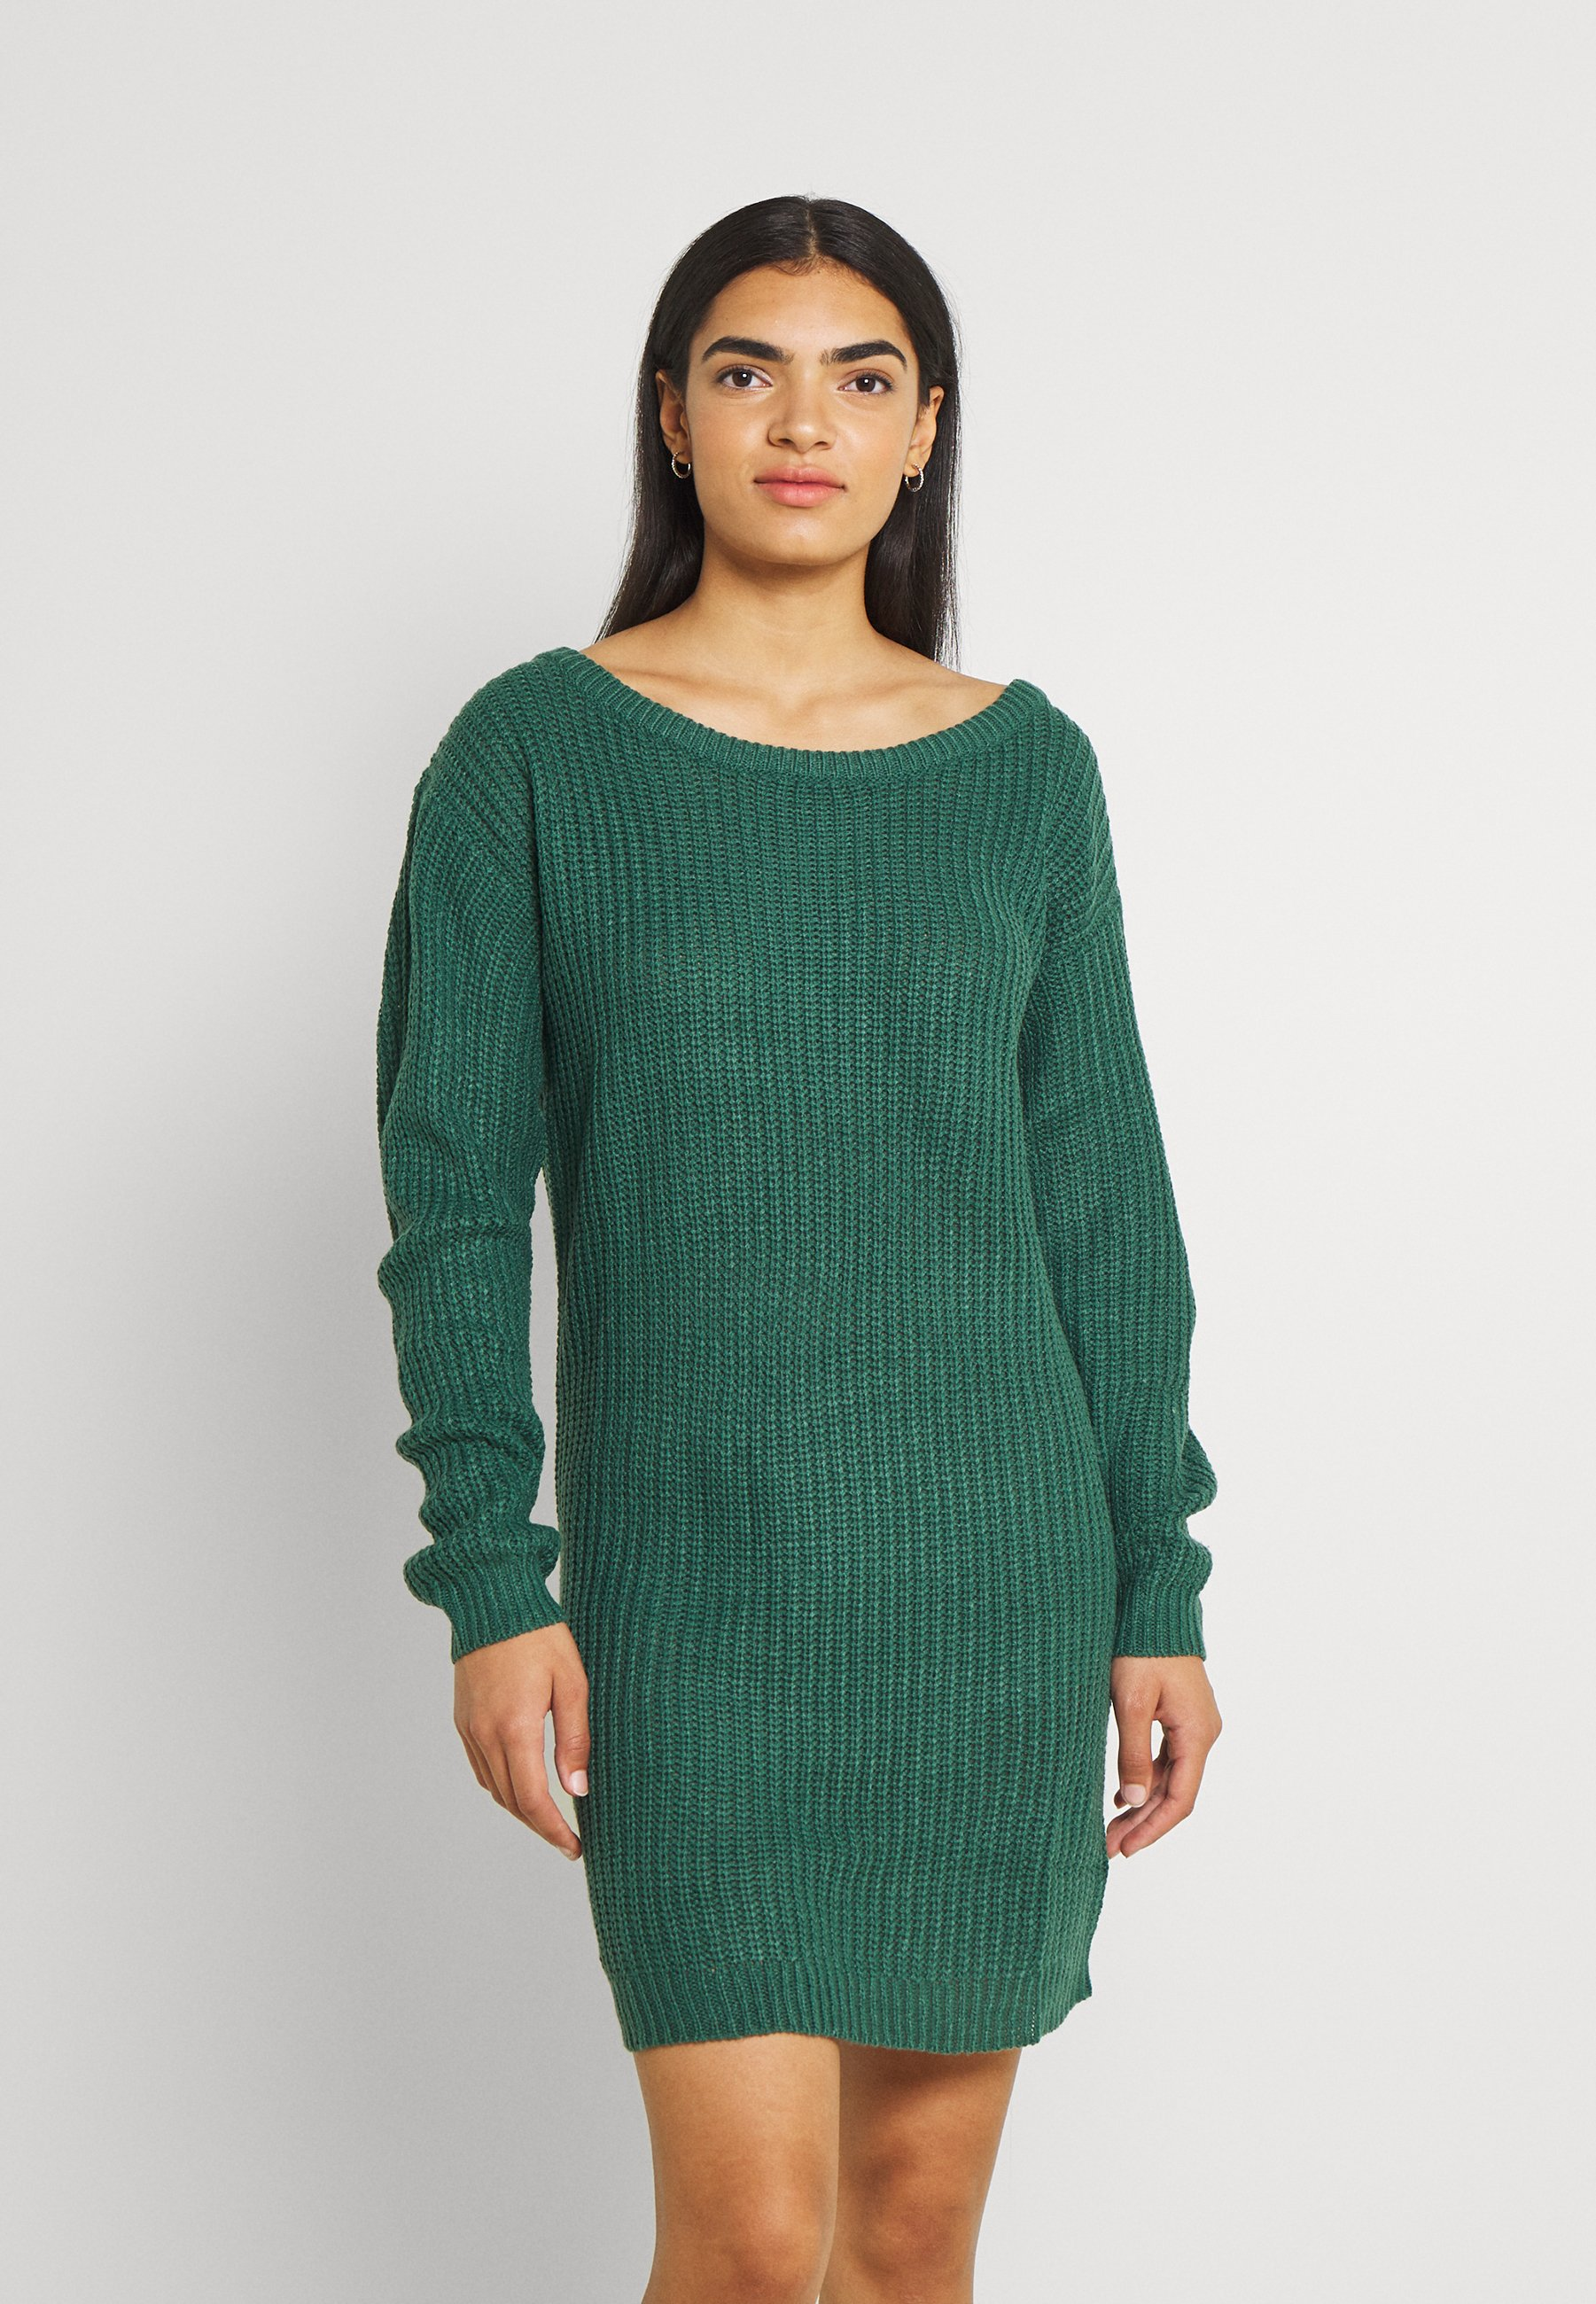 Women AYVAN OFF SHOULDER JUMPER DRESS - Jumper dress